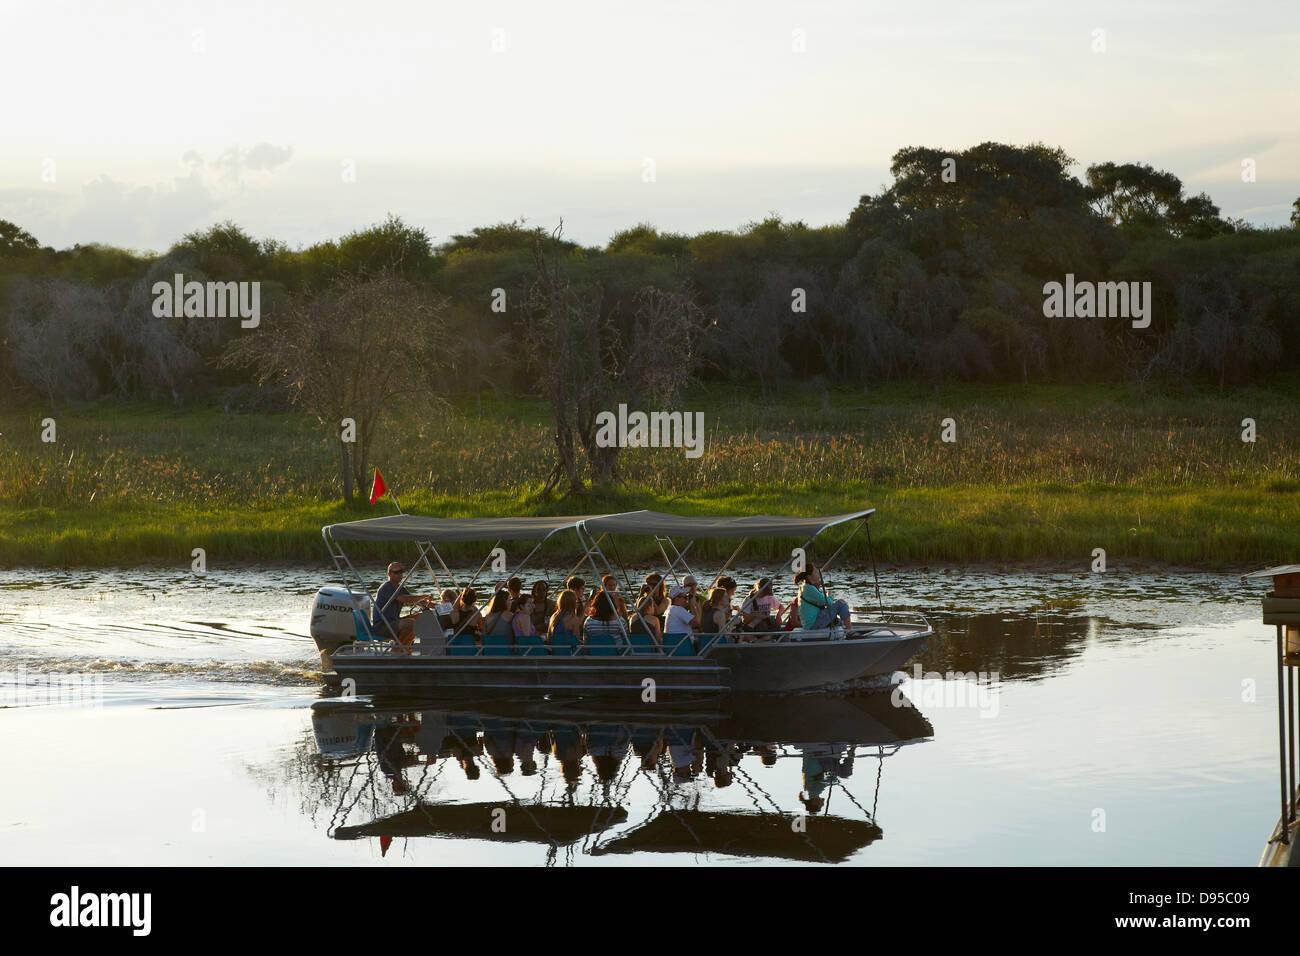 Tourist boat on Thamalakane River by Okavango River Lodge, Maun, Okavango Delta, Botswana, Africa - Stock Image